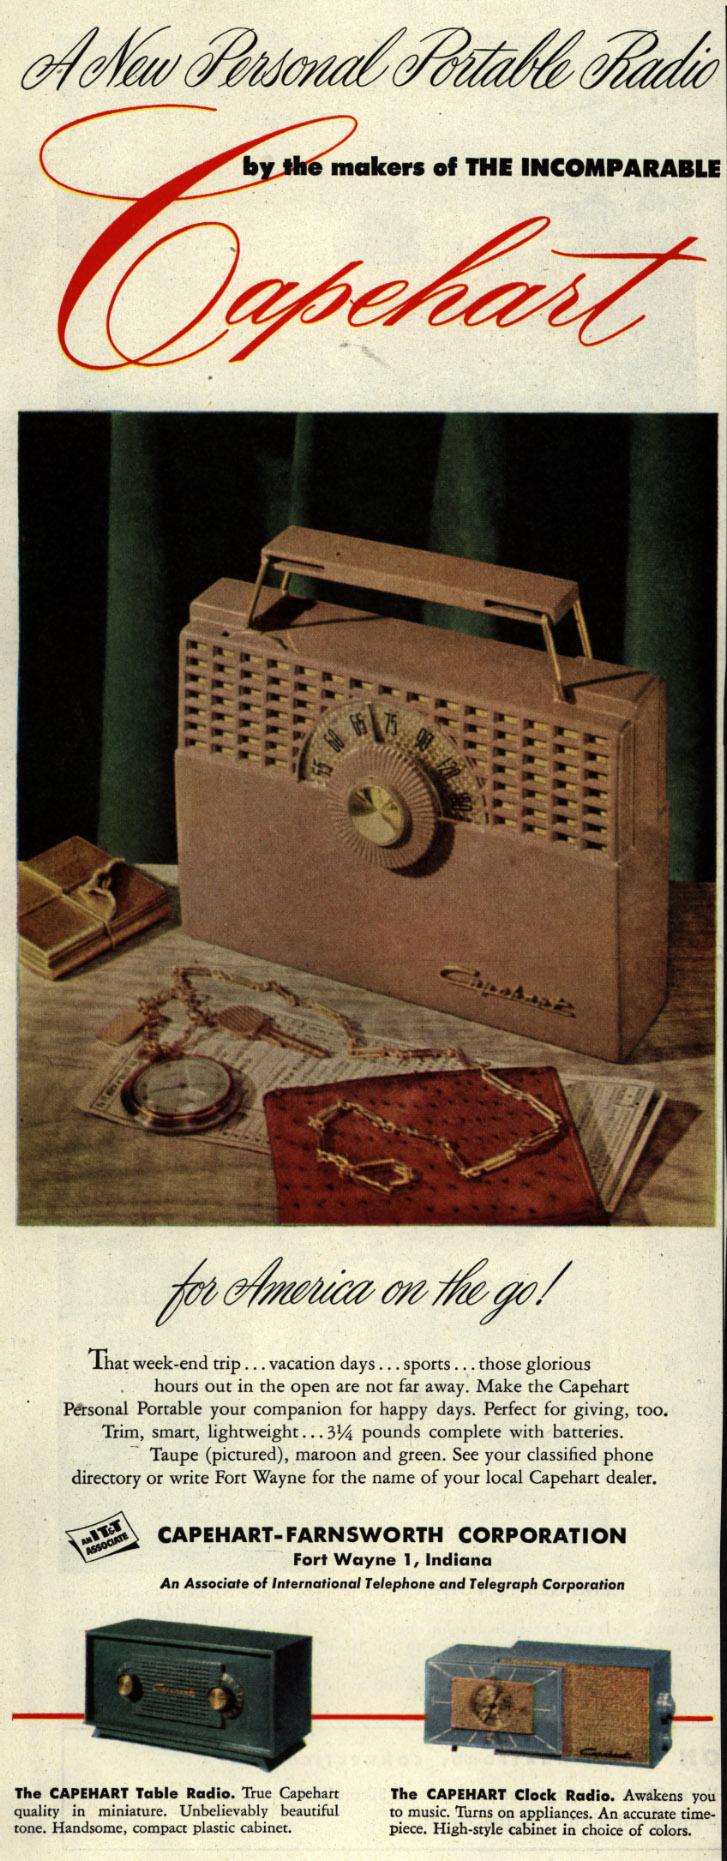 New Personal Portable Radio